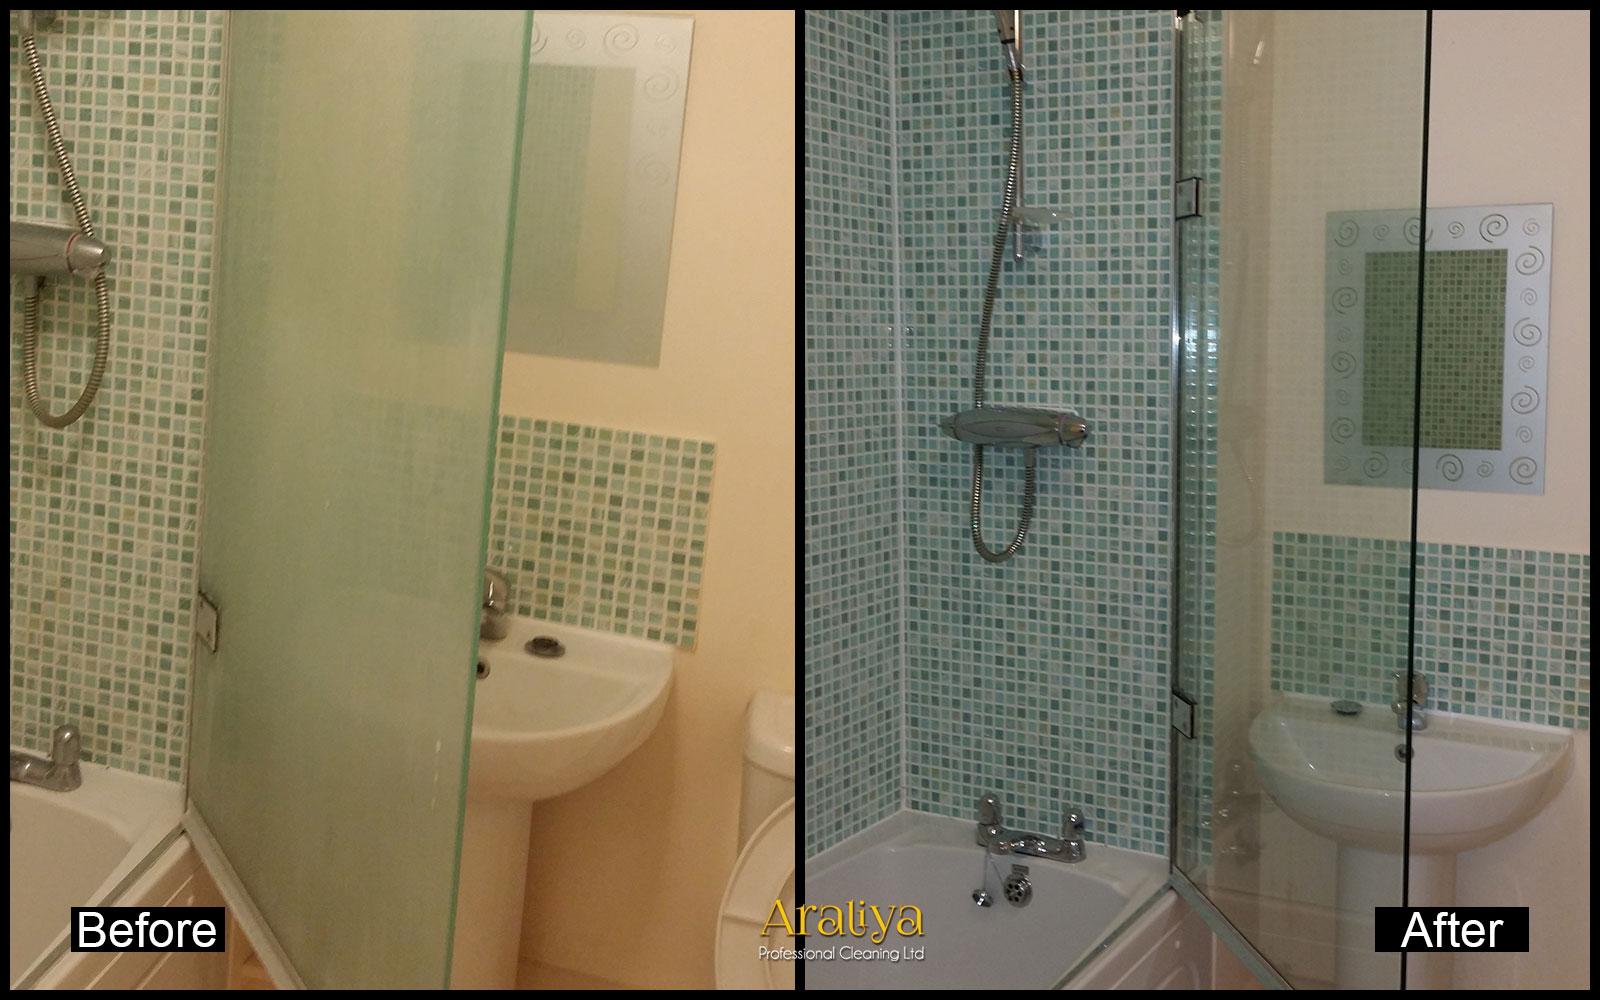 Araliya Professional Cleaning Ltd In Basingstoke - Professional bathroom cleaning